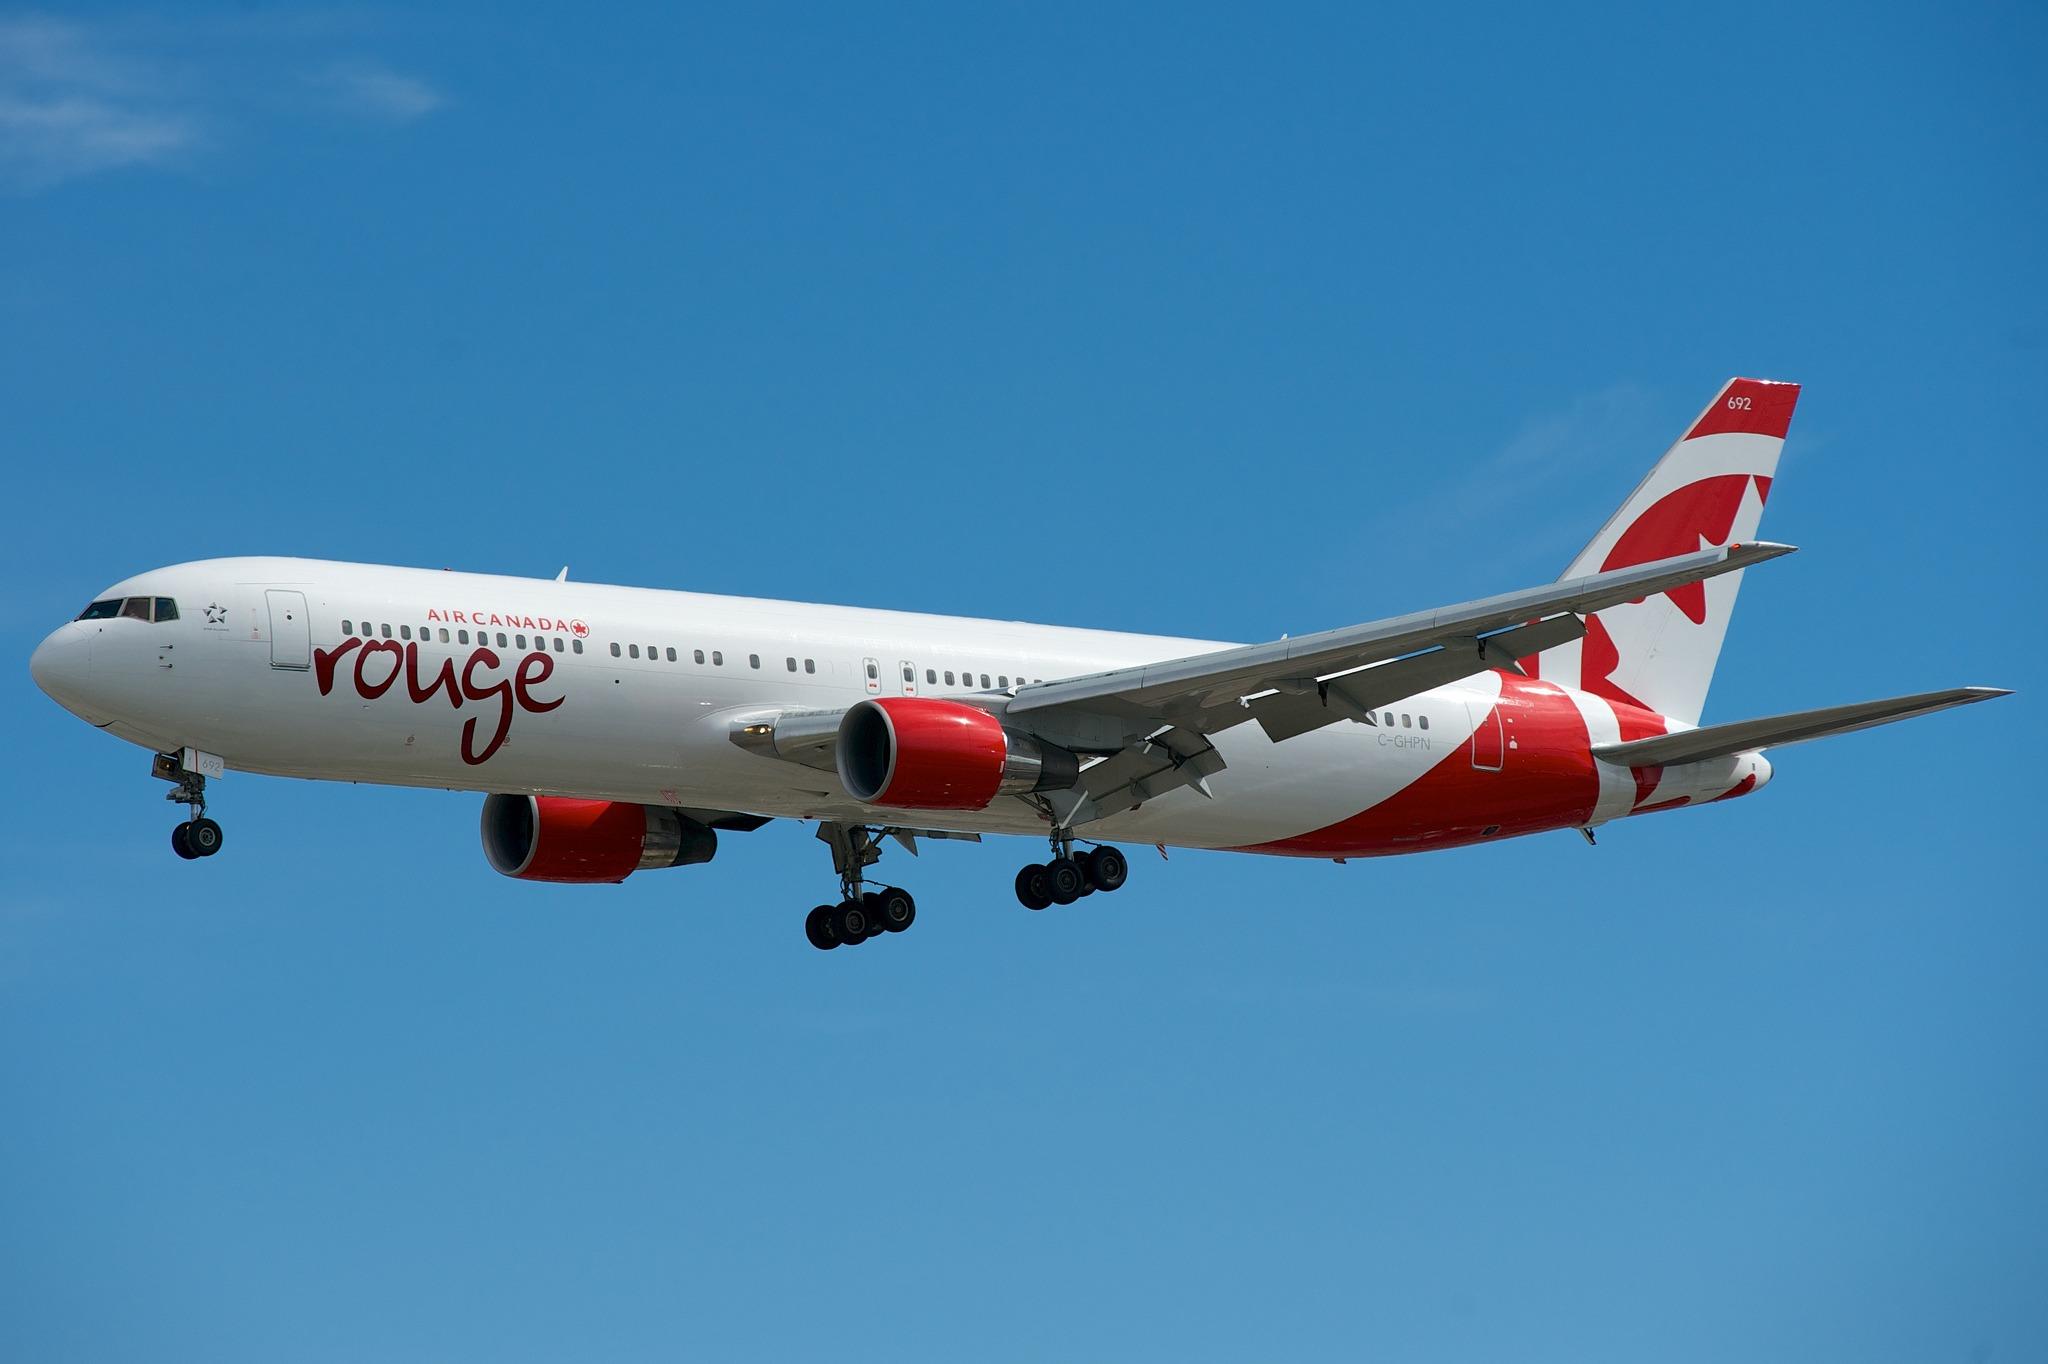 Air Canada Rouge Boeing 767-300ER C-GHPN par BriYYZ sous (CC BY-SA 2.0) https://www.flickr.com/photos/bribri/9403122522/